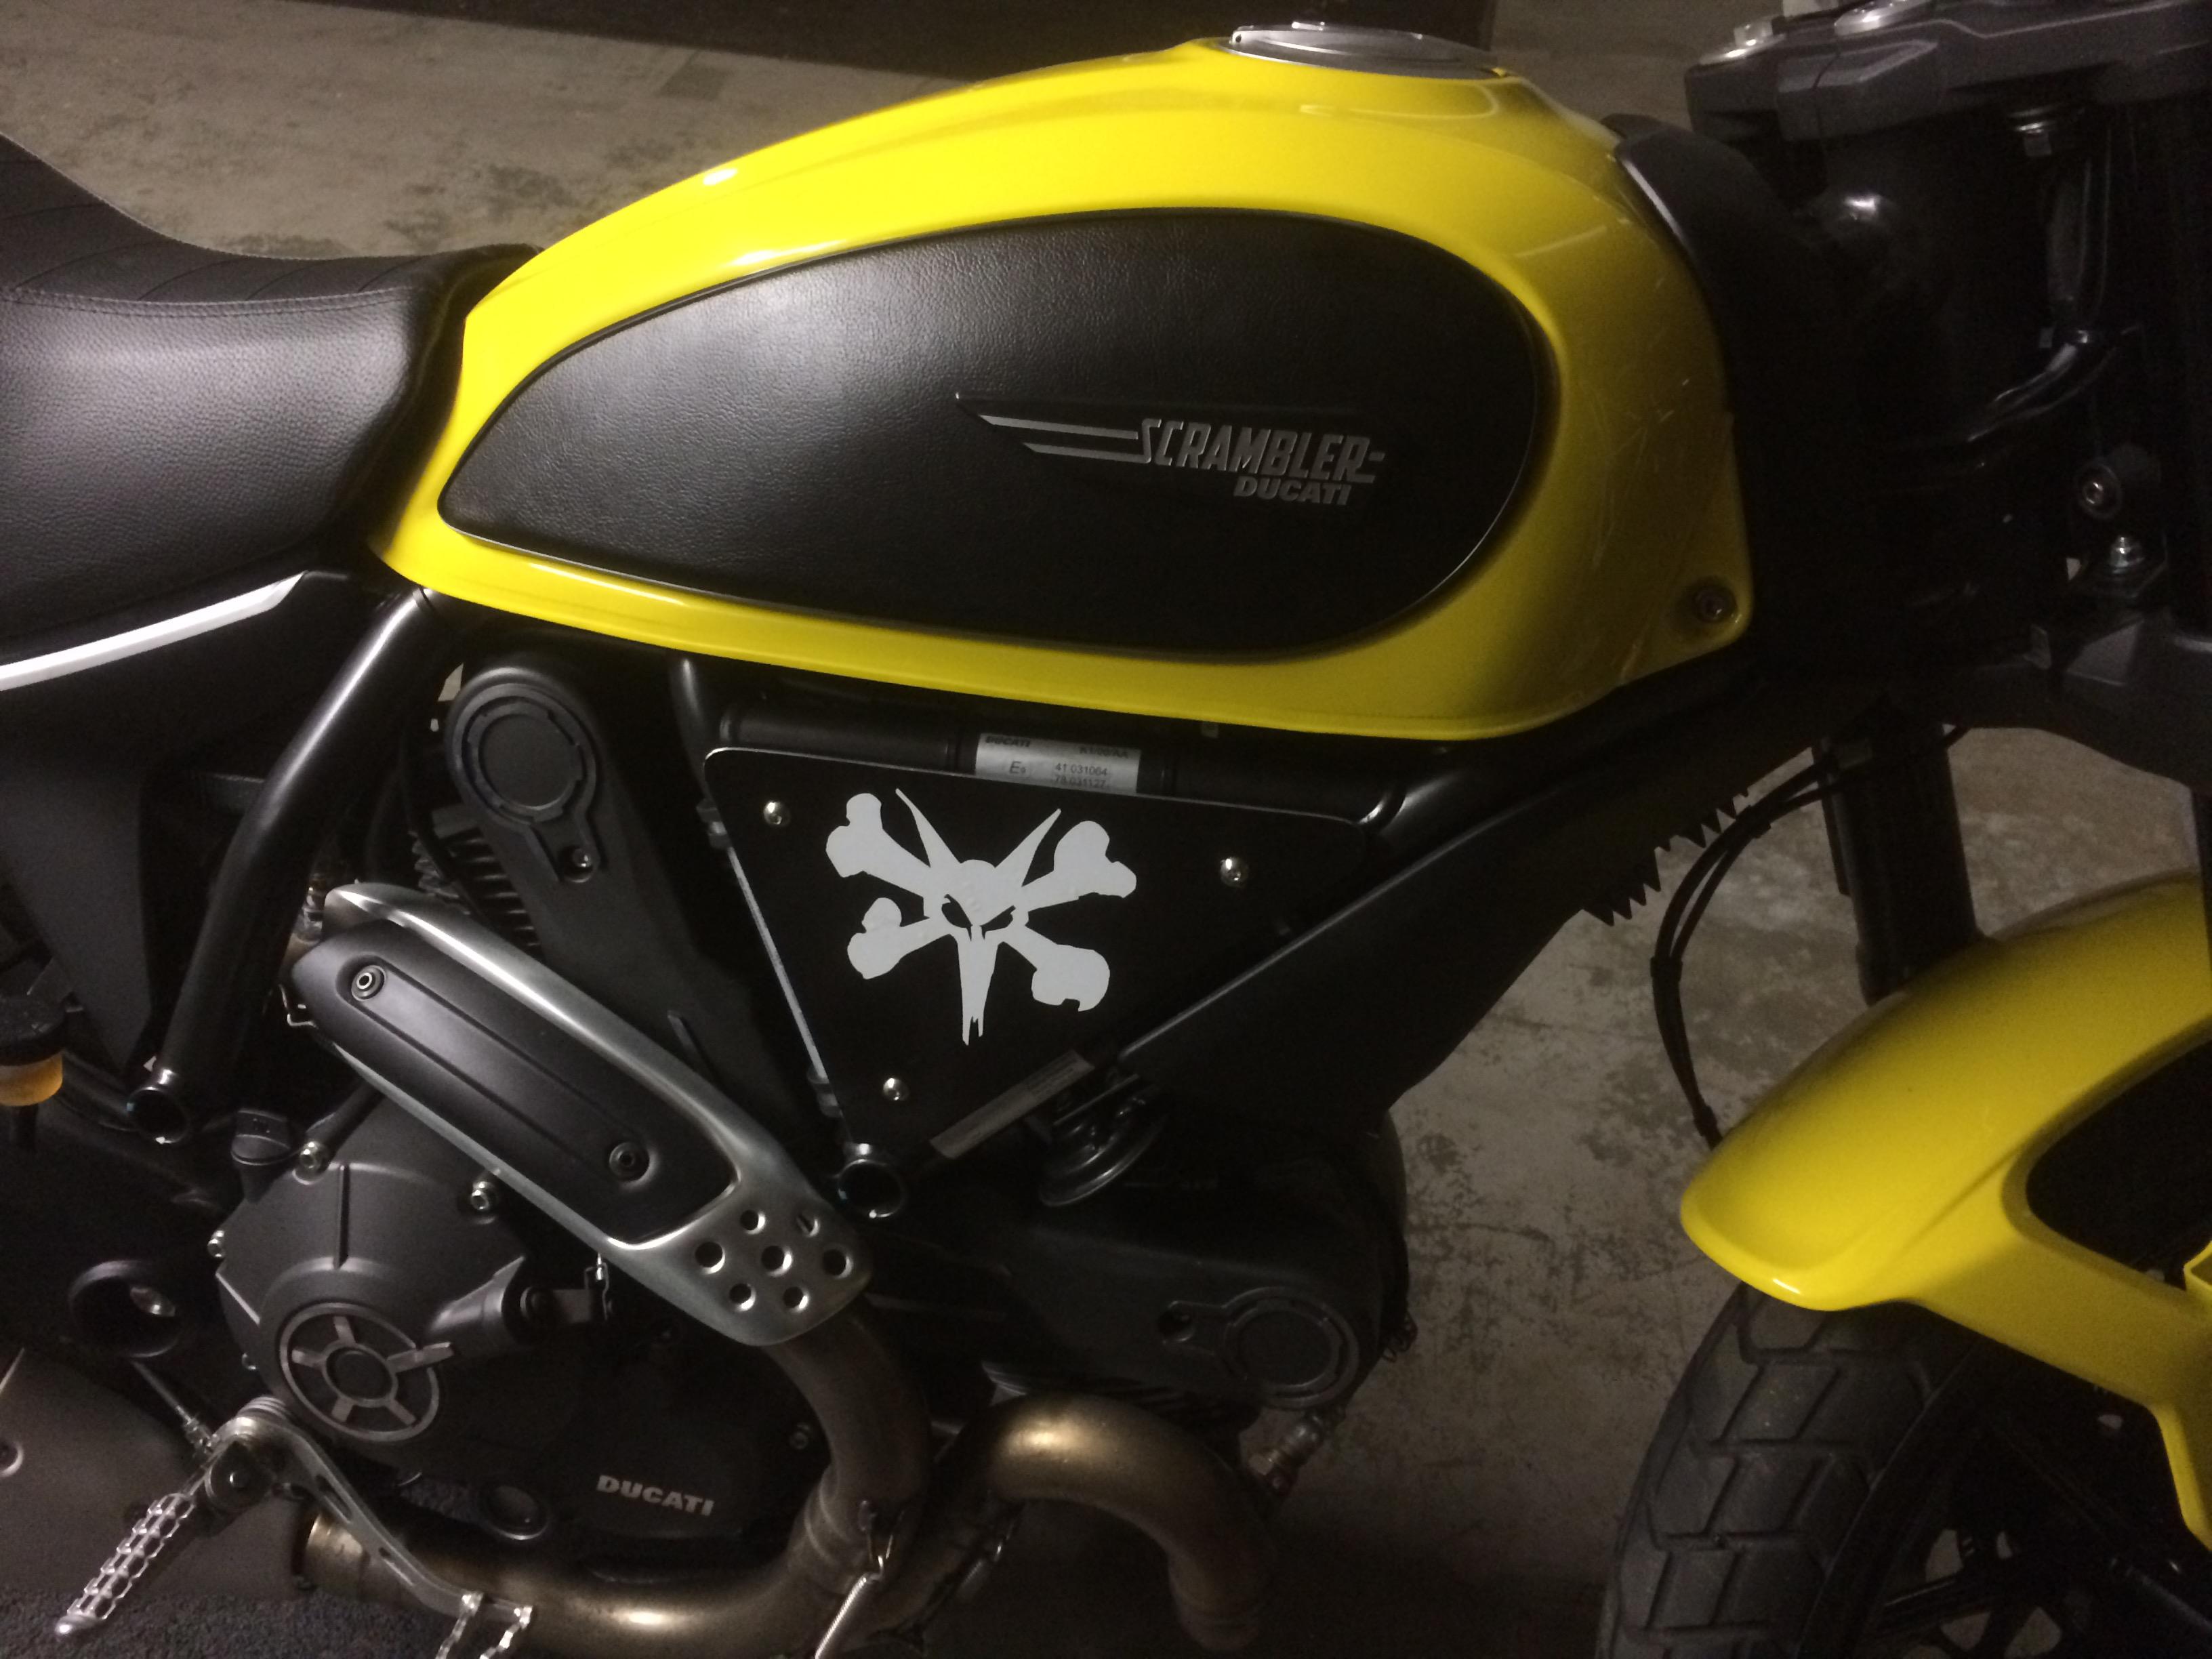 Vinyl Wrapped Tank Panel Ducati Scrambler Forum